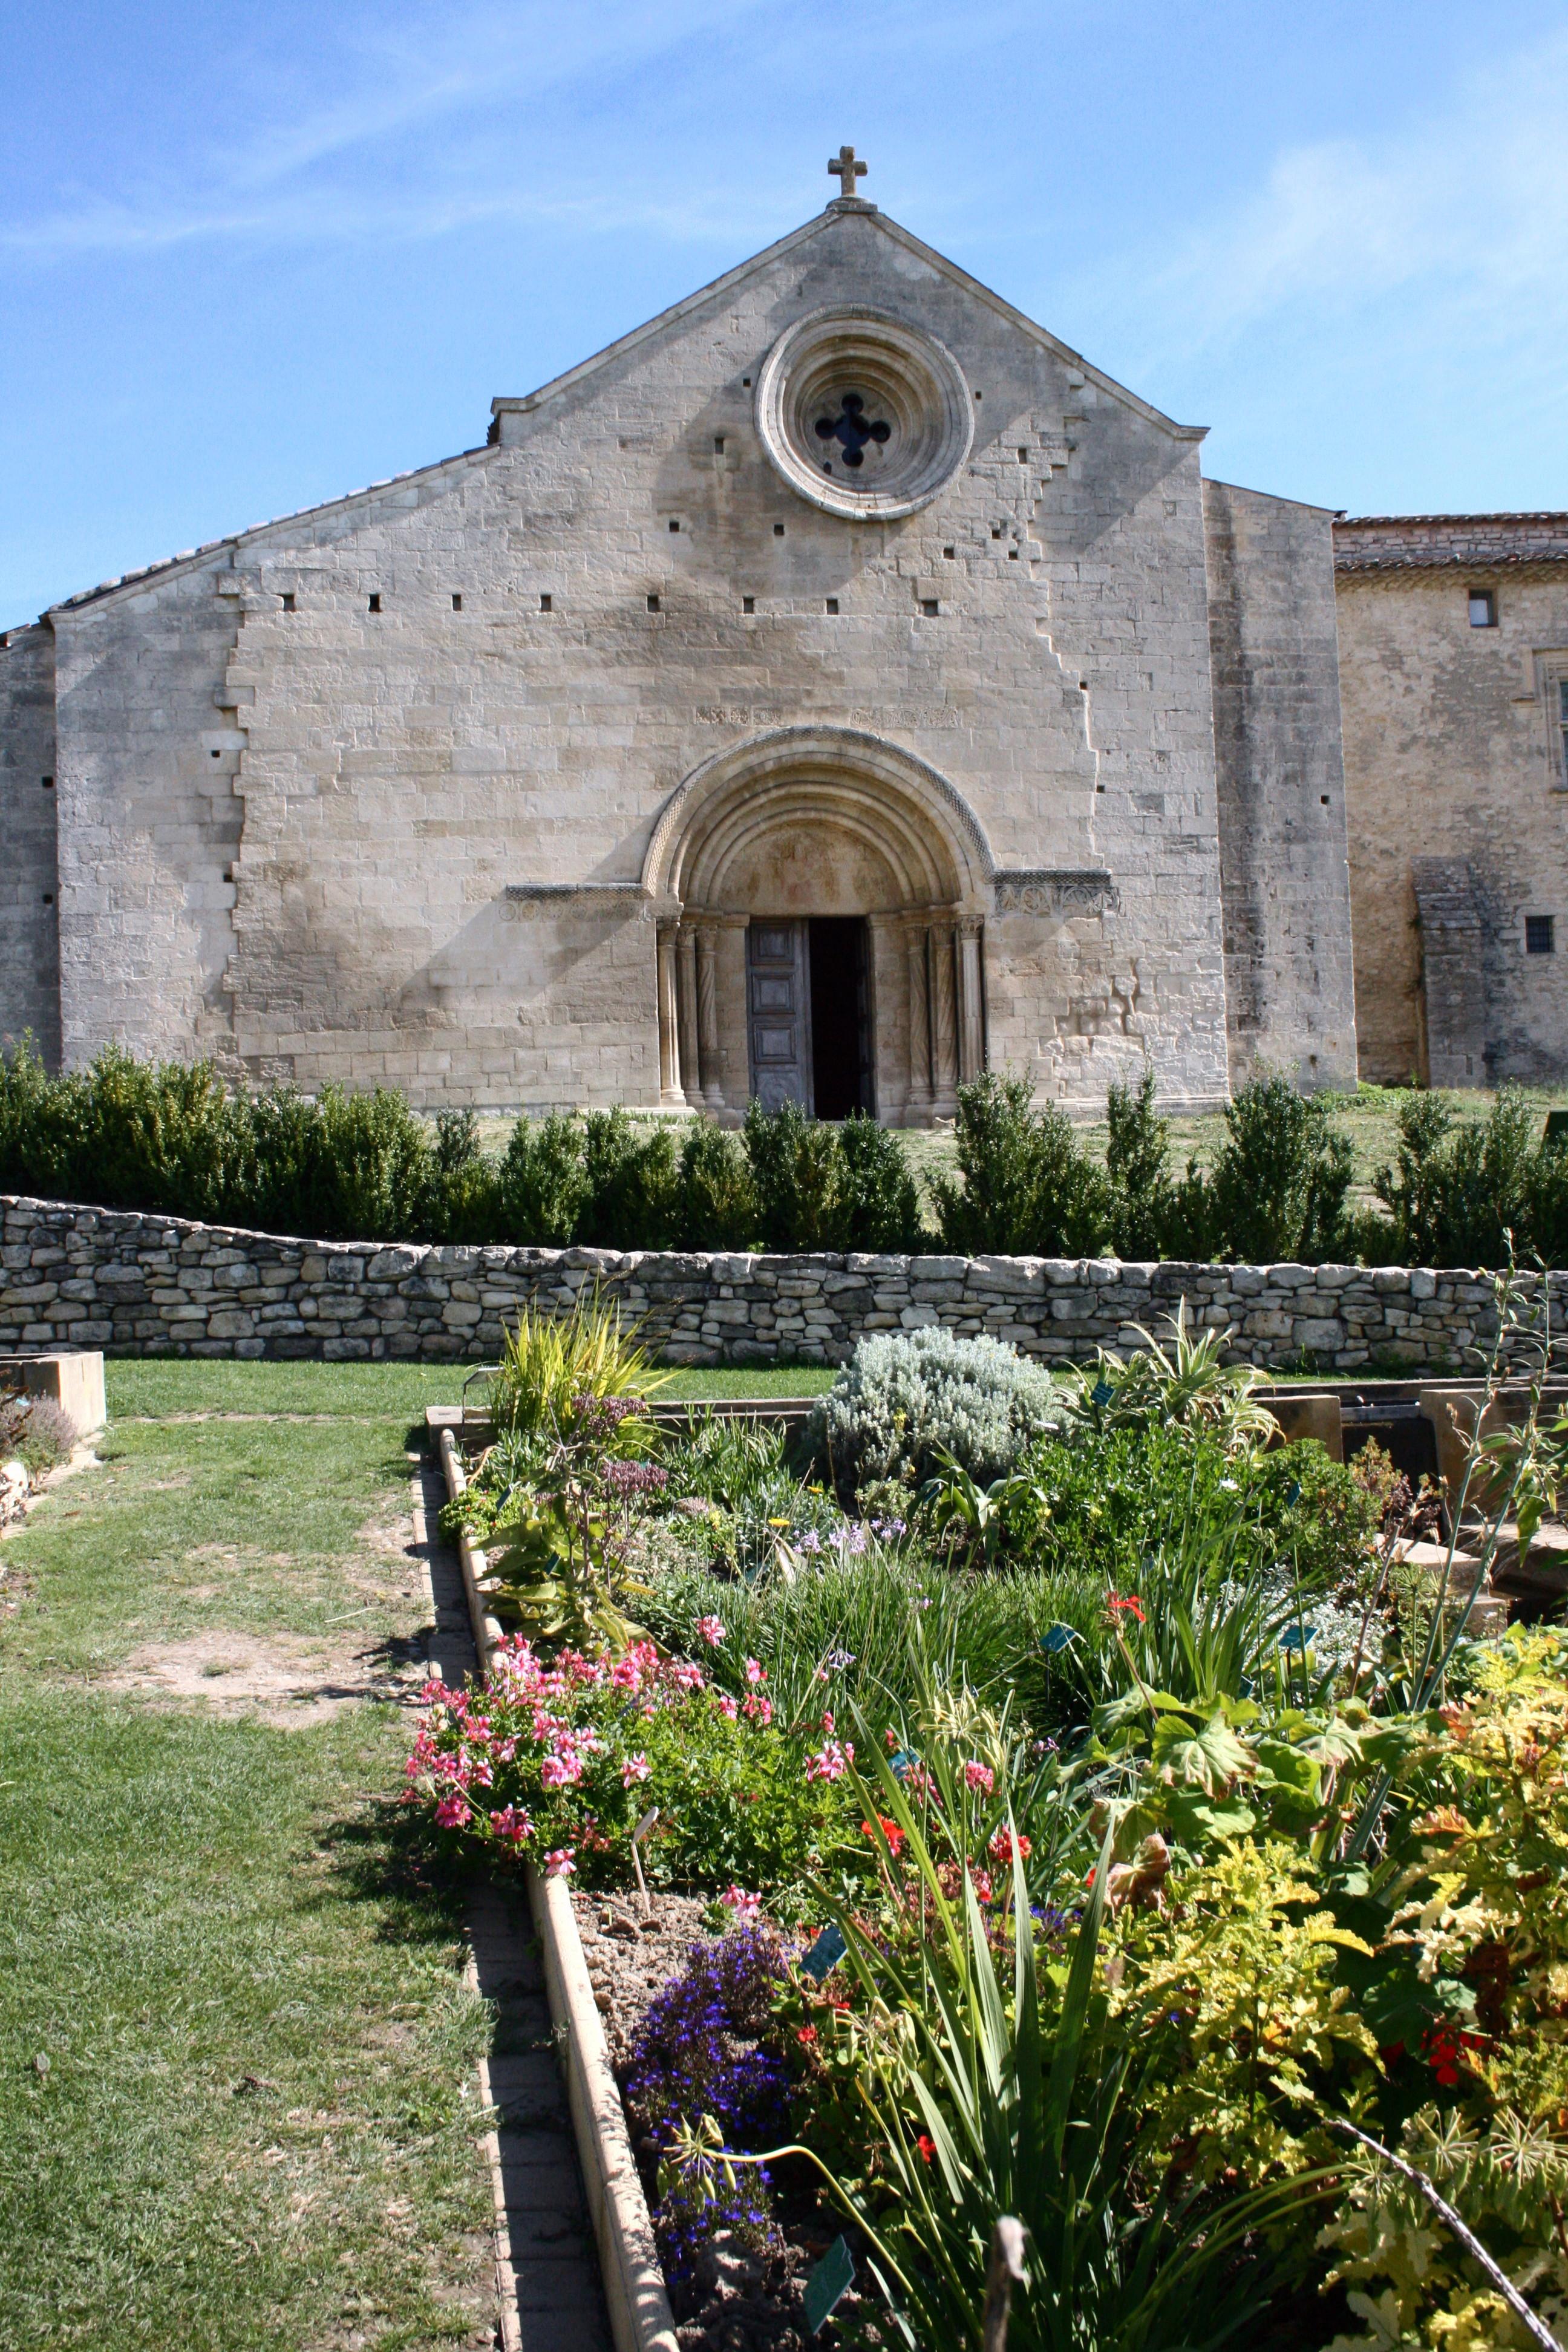 Jardines de Salagon - Wikipedia, la enciclopedia libre